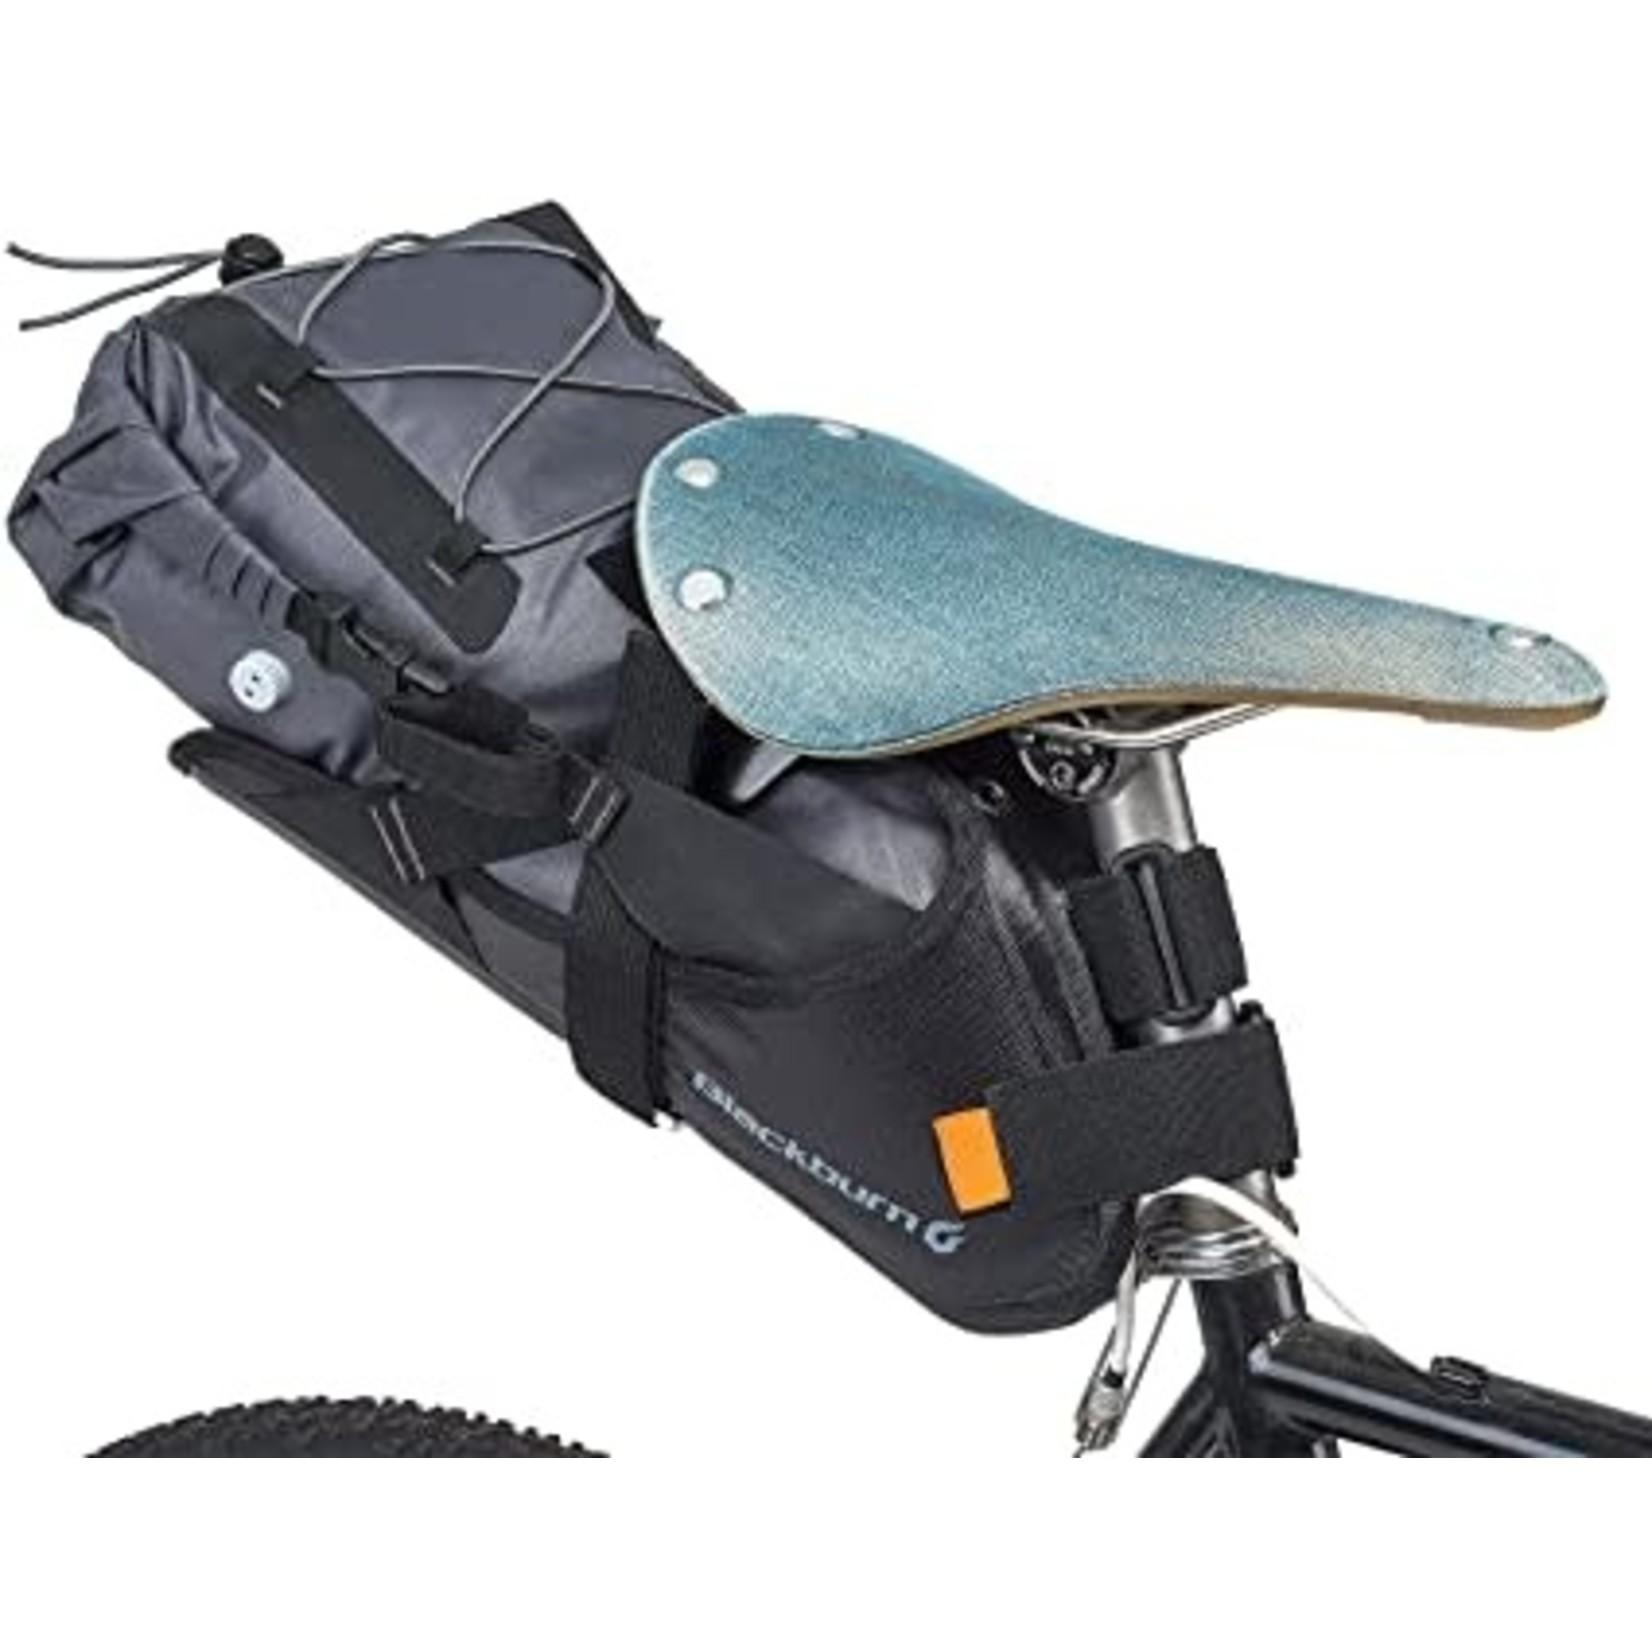 Blackburn OUTPOST ELITE UNIVERSAL SEAT PACK